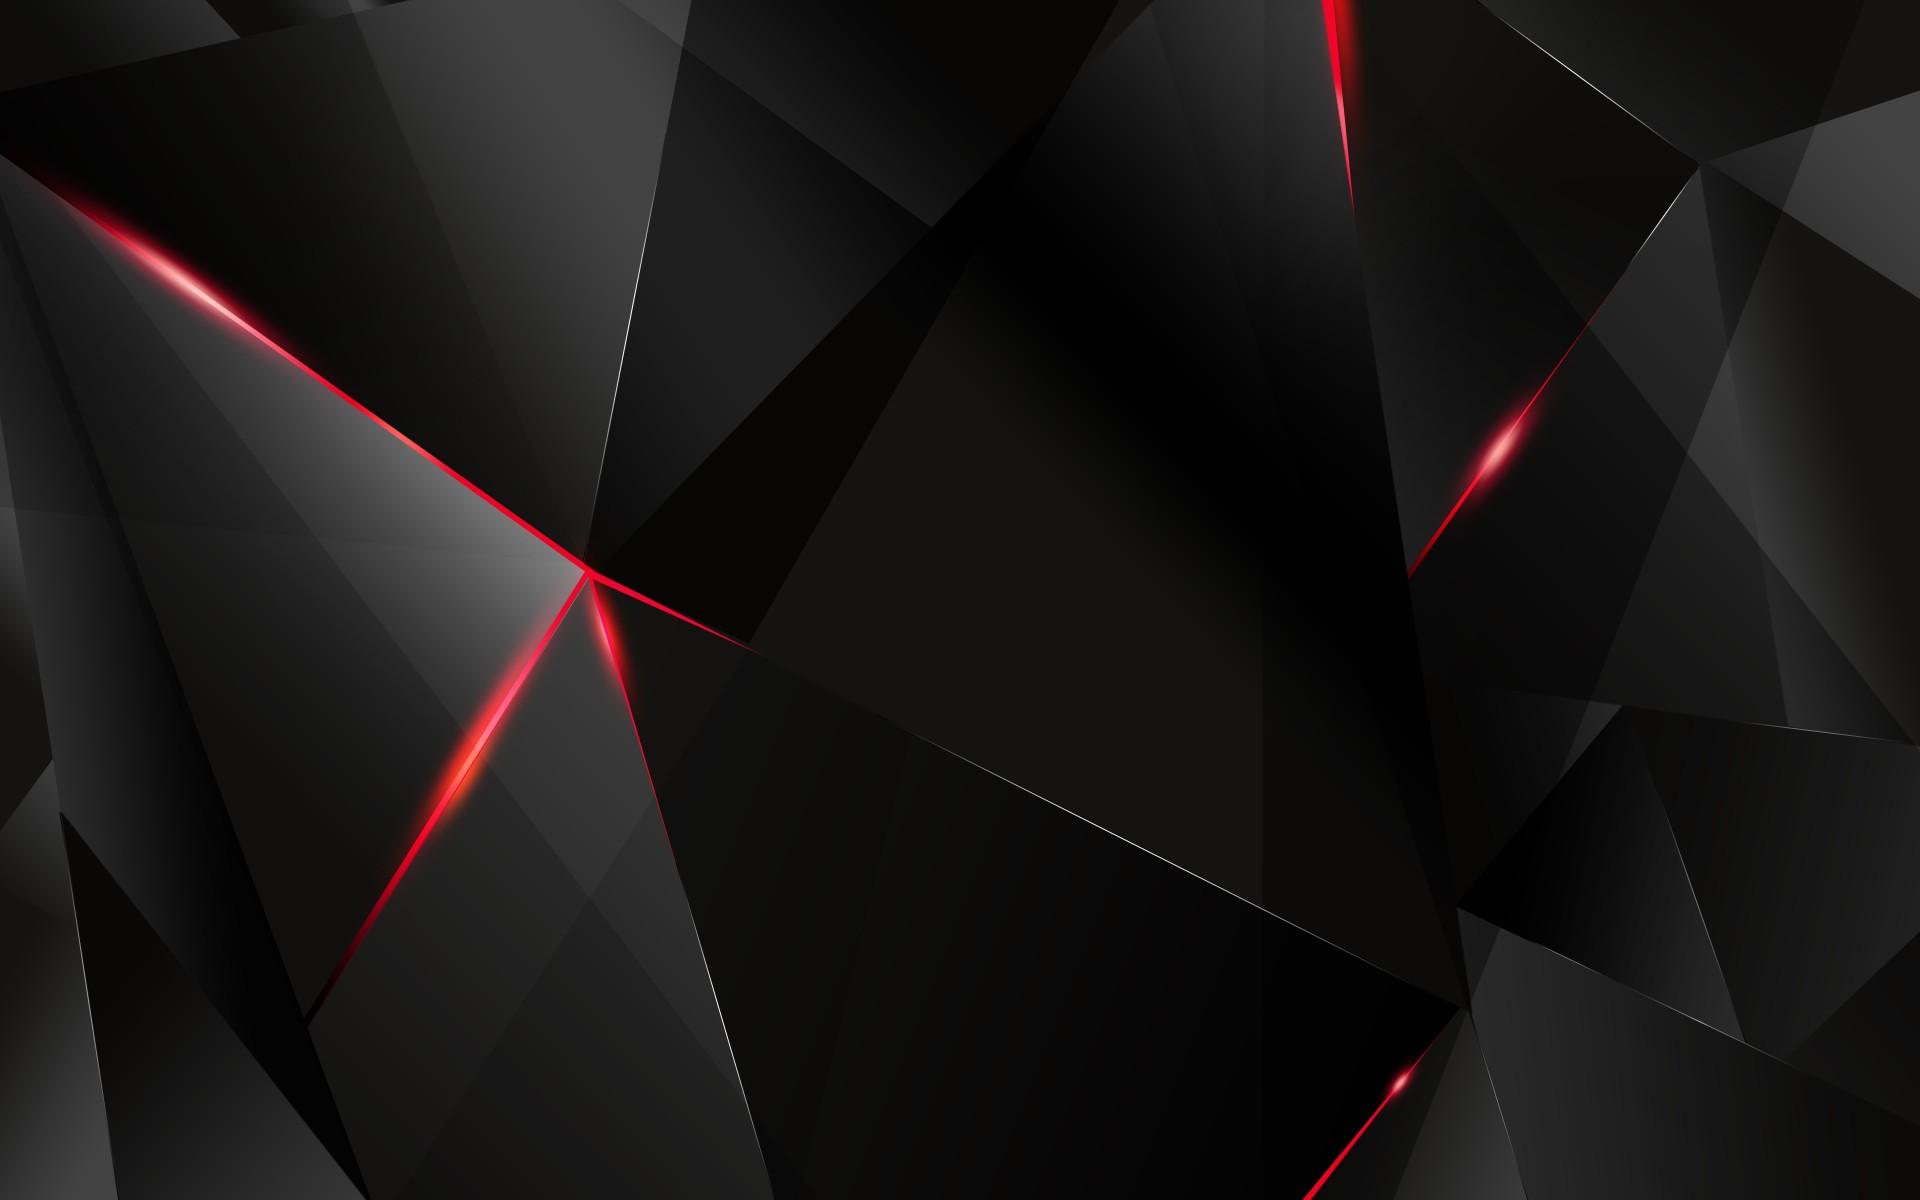 Plain Black 3D 7 Free Hd Wallpaper